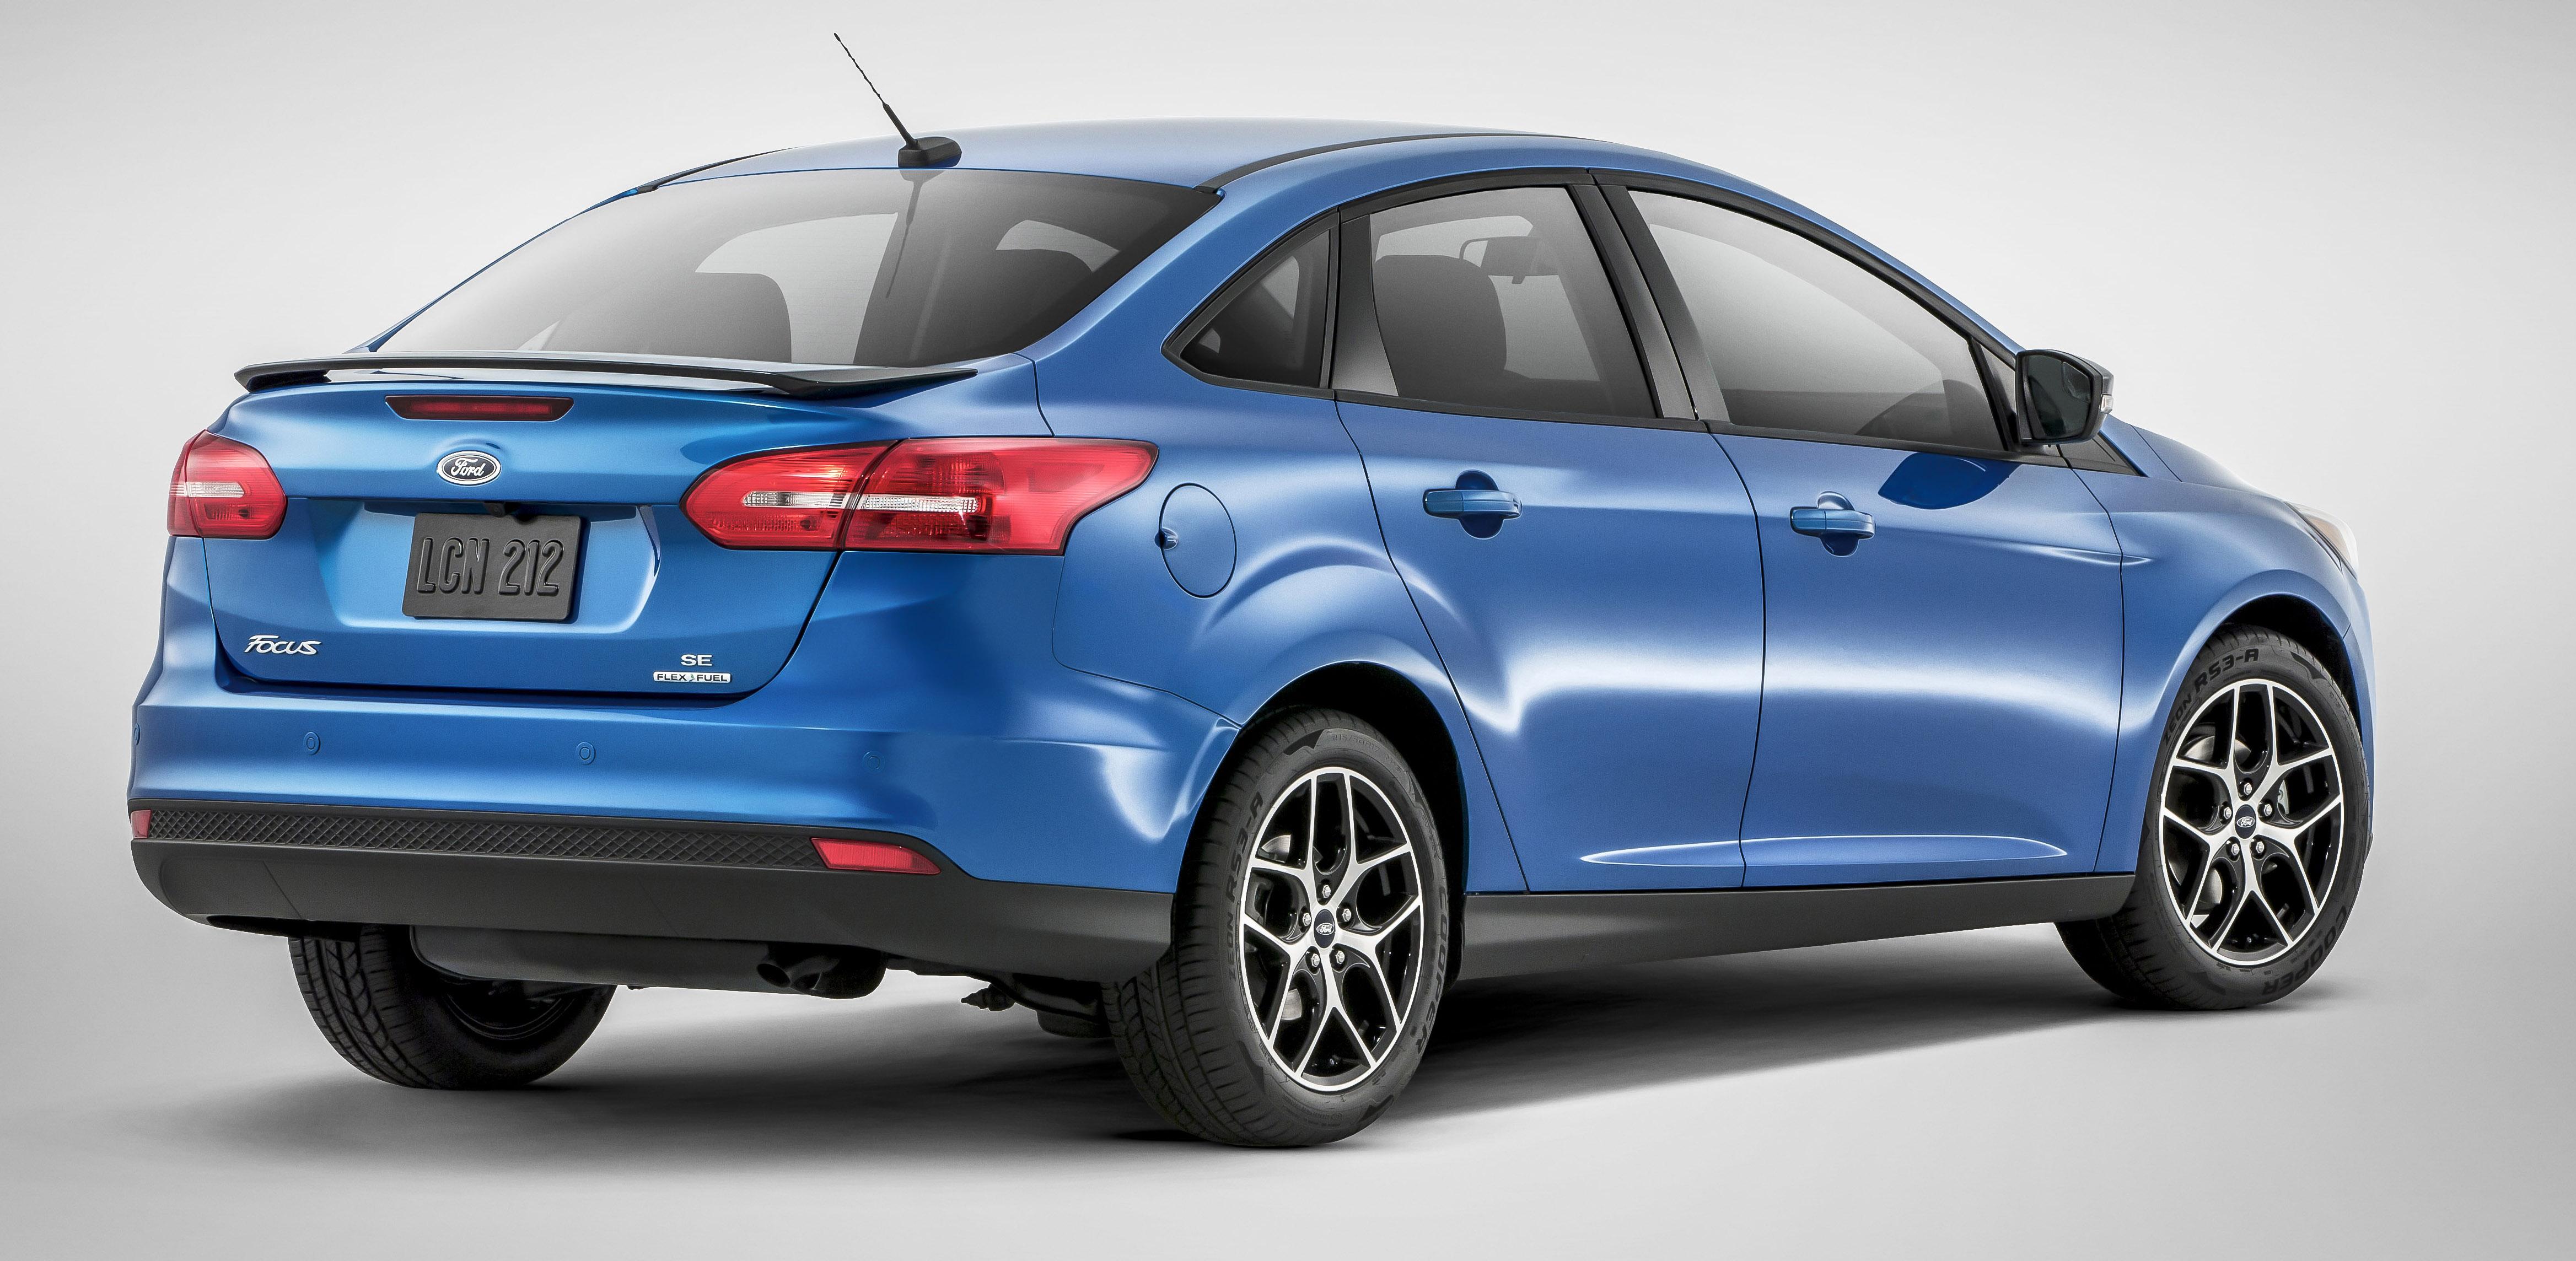 2015 ford focus sedan facelift unveiled new rear end. Black Bedroom Furniture Sets. Home Design Ideas